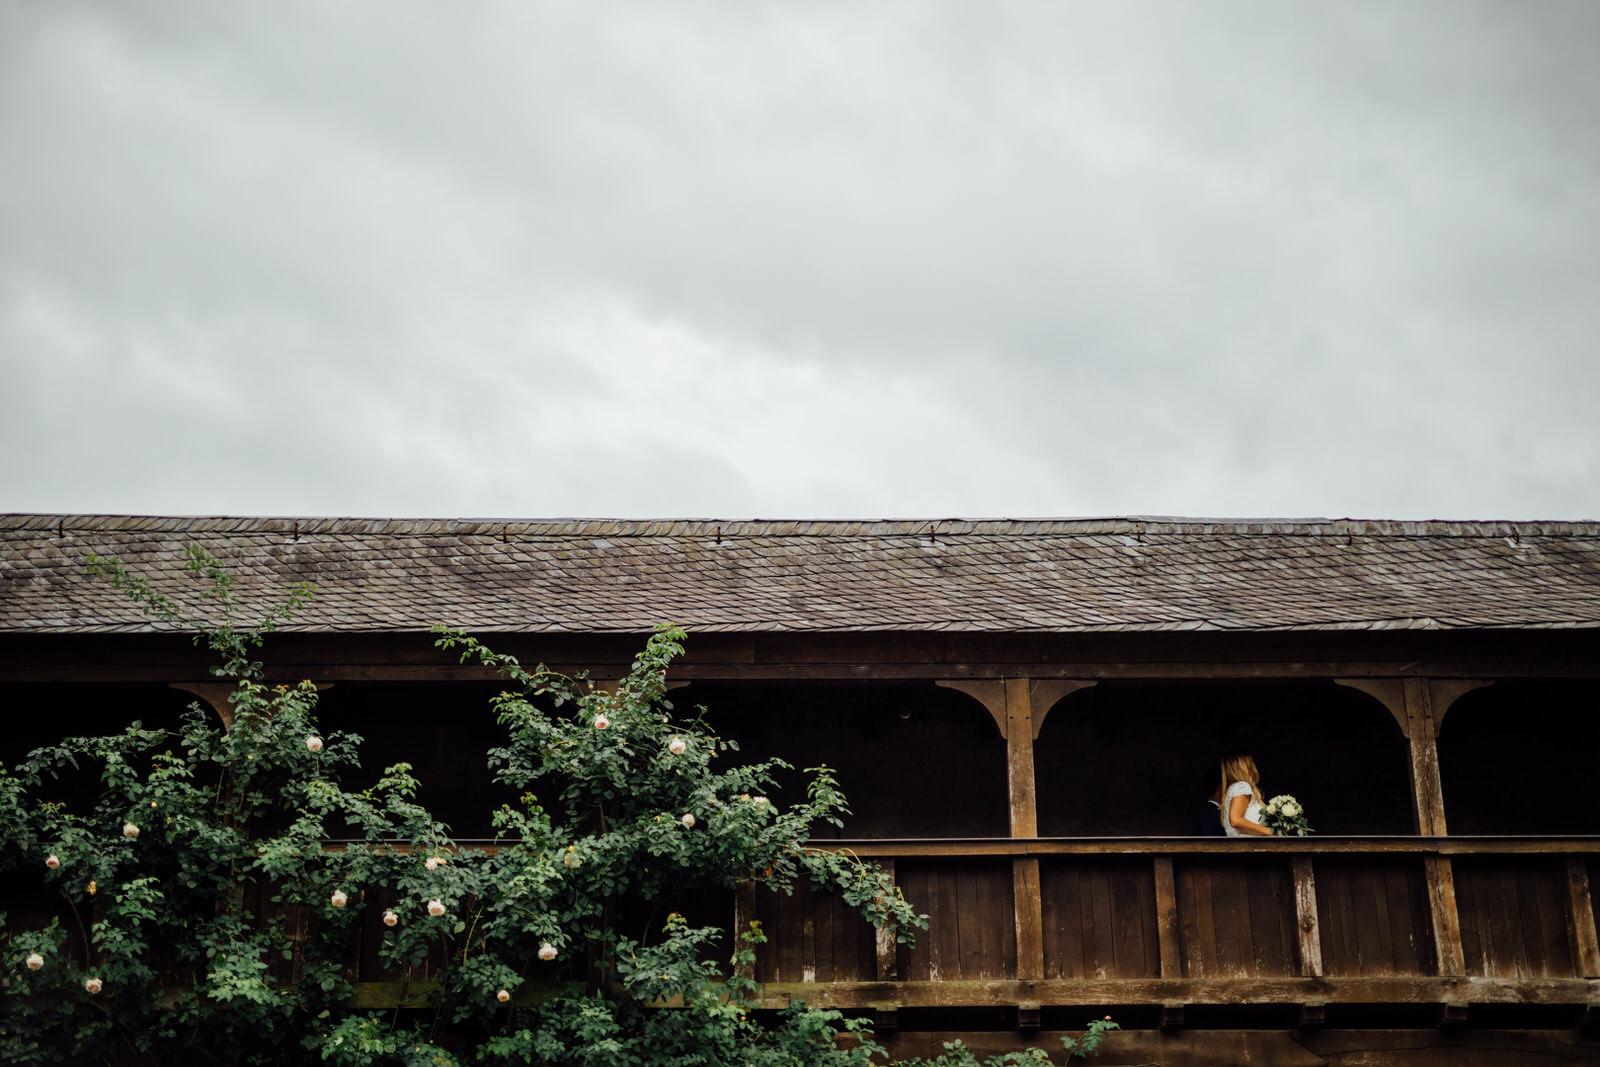 Paul_Traeger_Hochzeitsfotograf_Thueringen_Erfurt_Jena_Weimar_100221242.JPG